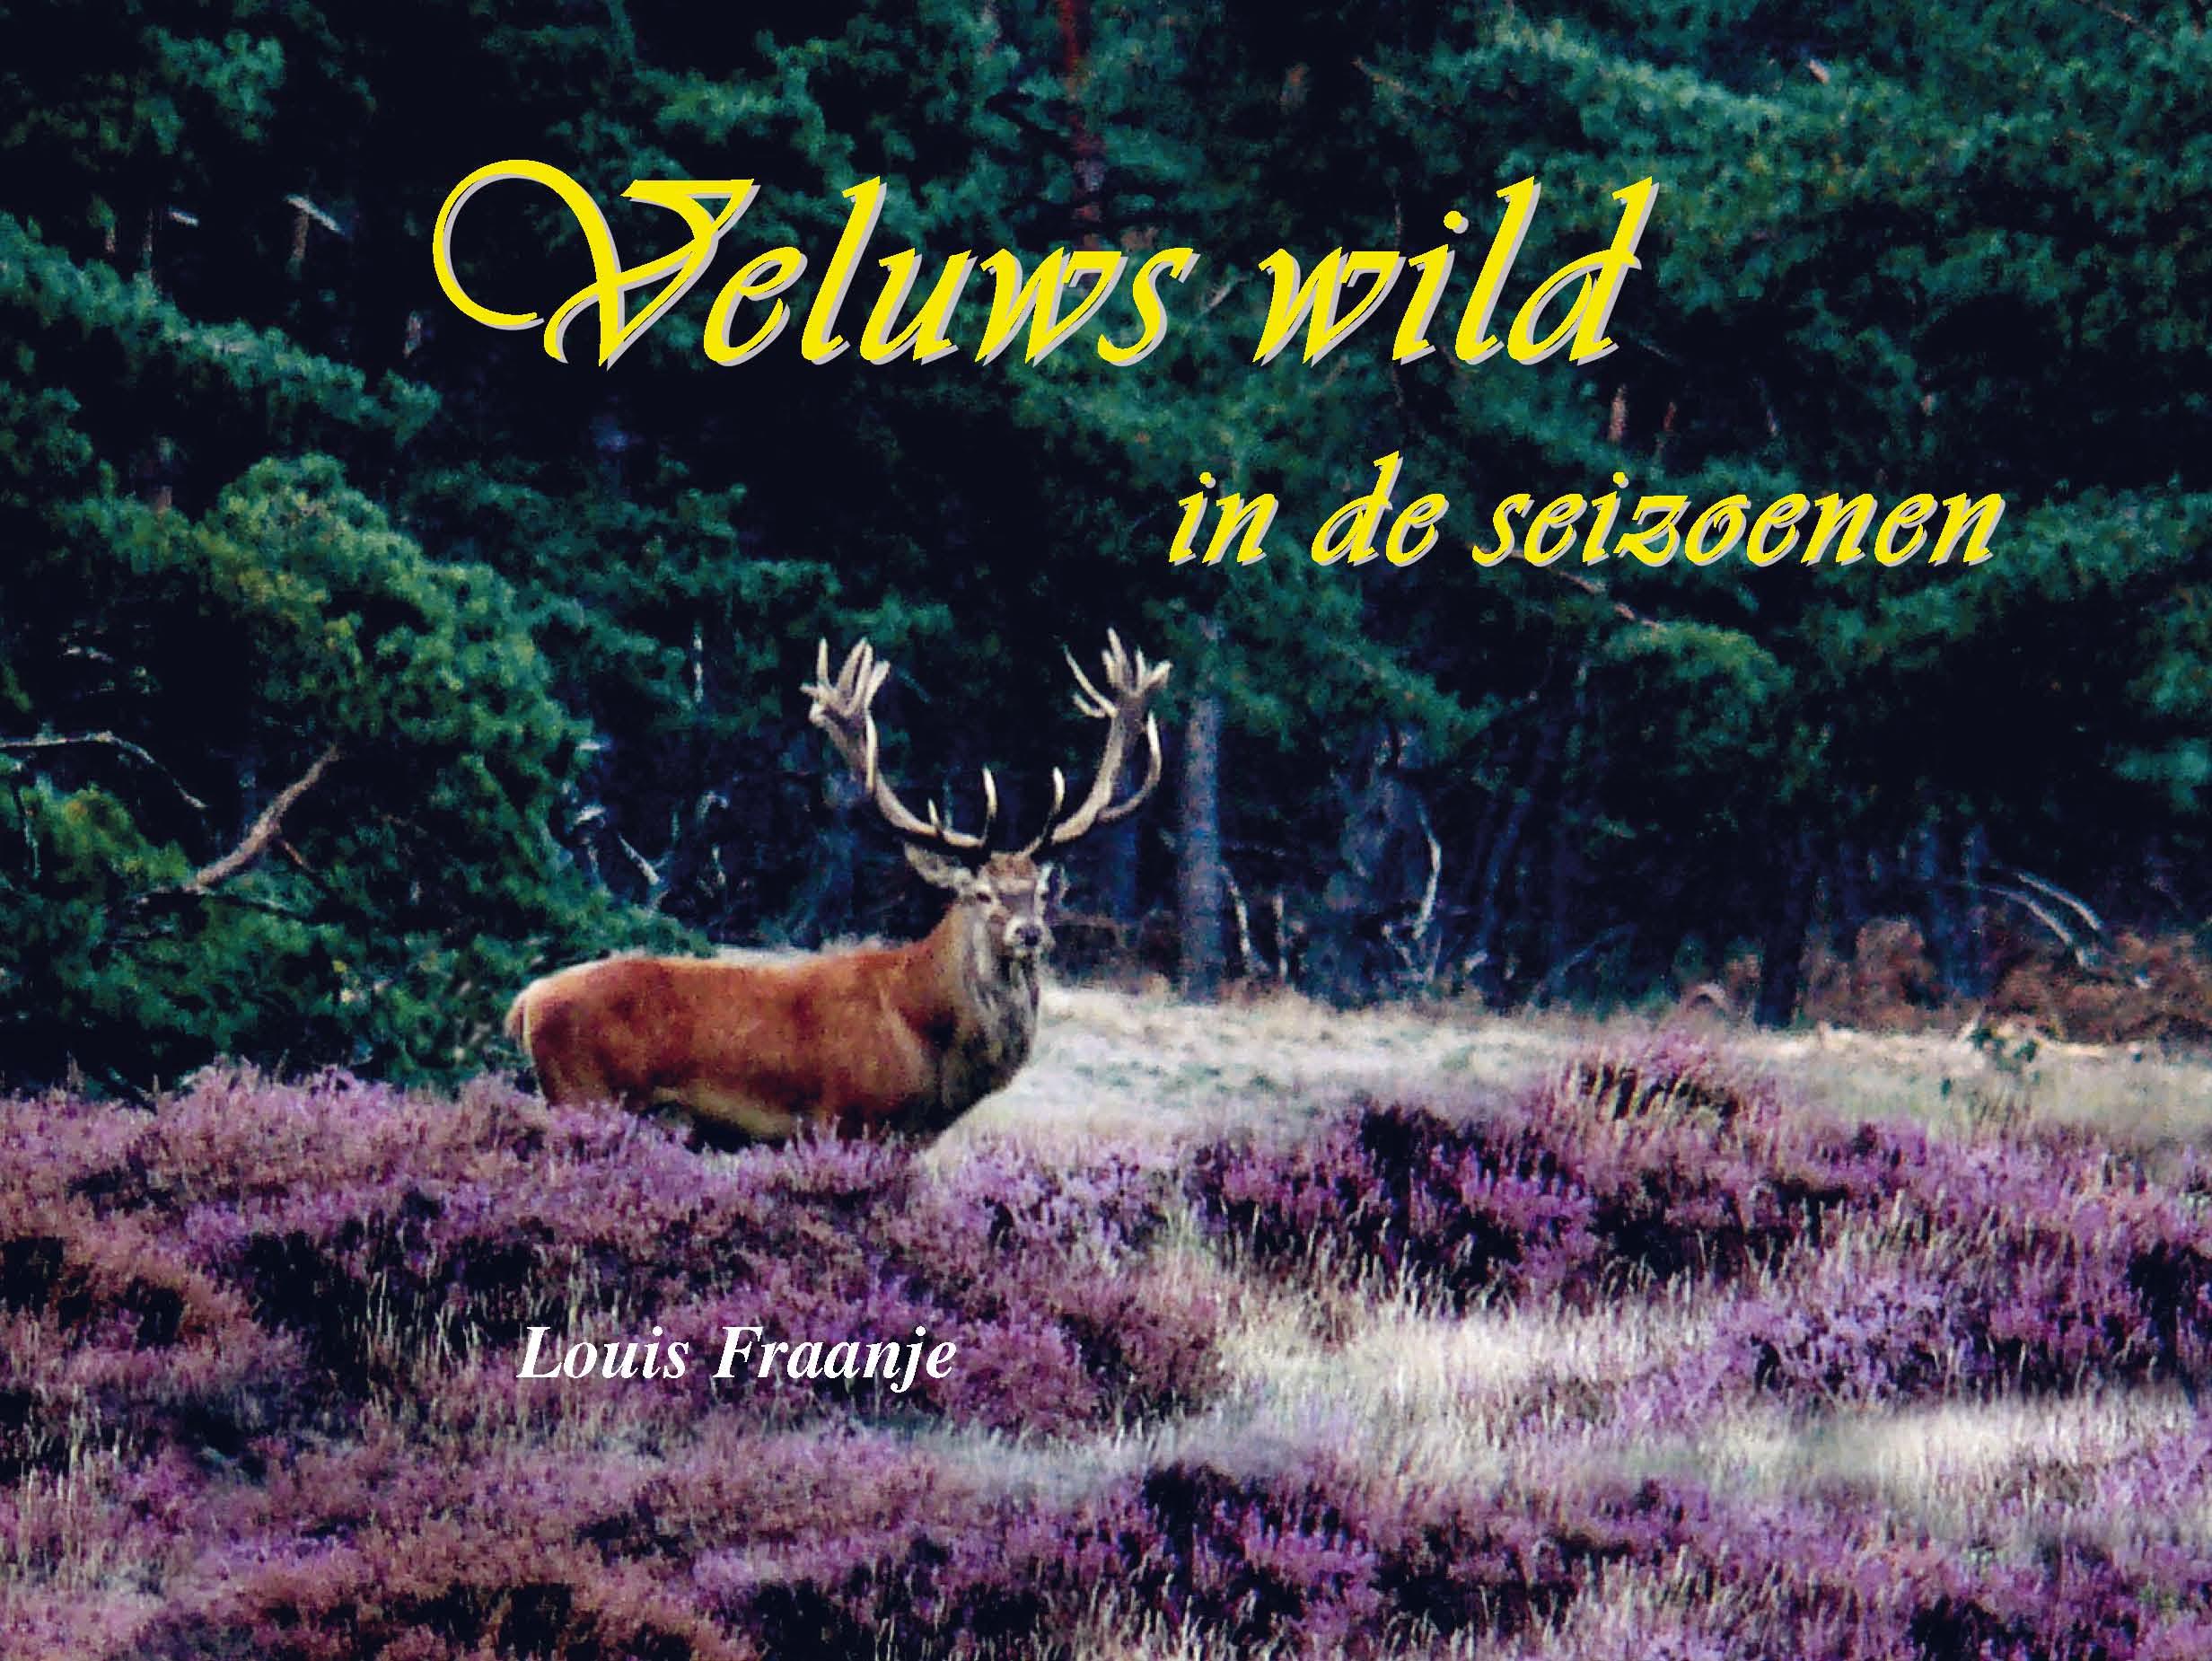 OS Veluws wild in de